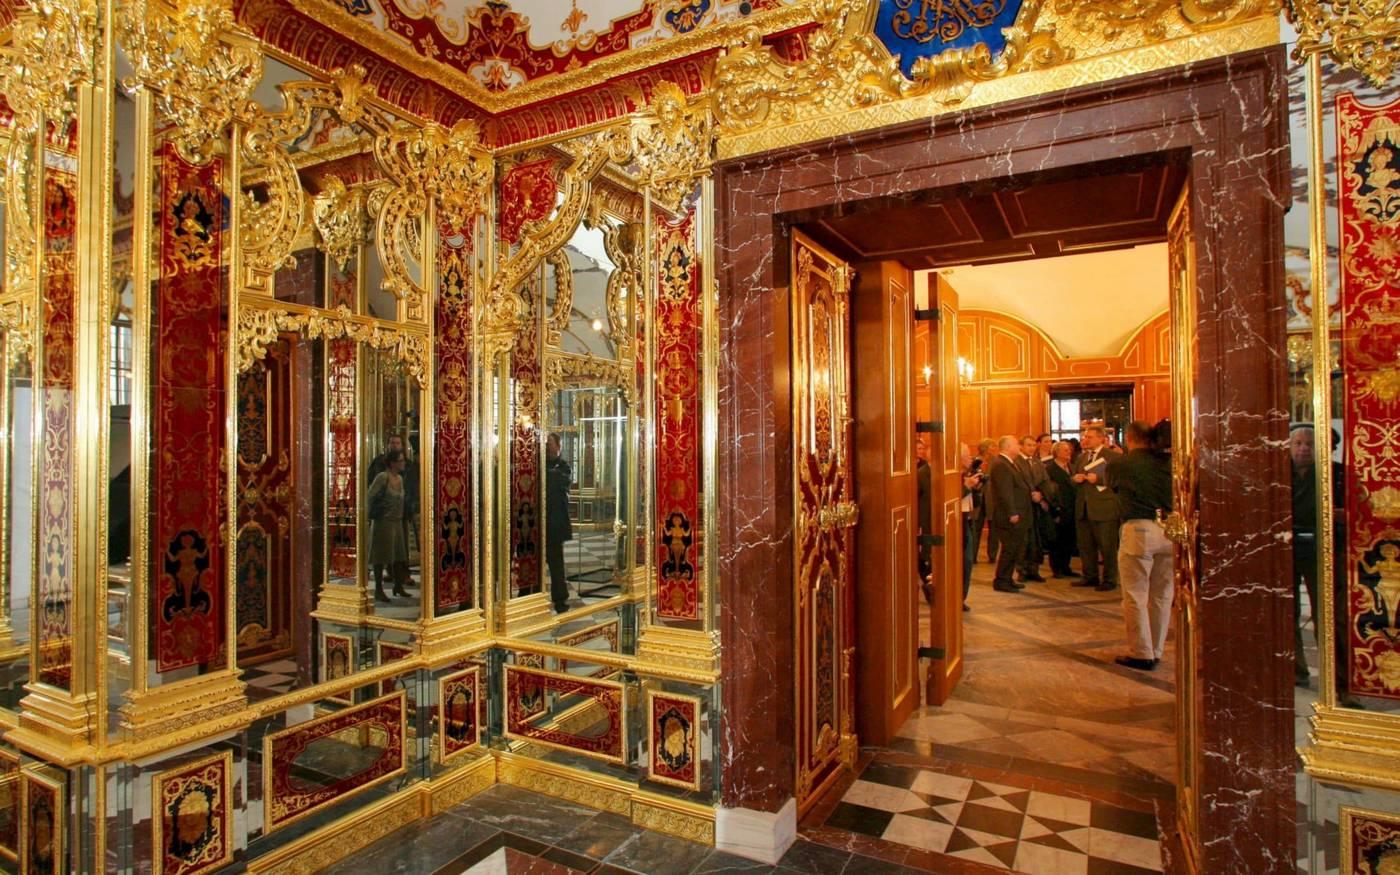 The largest postwar art heist – Thieves rob $1 billion worth of uninsured jewels from a German museum